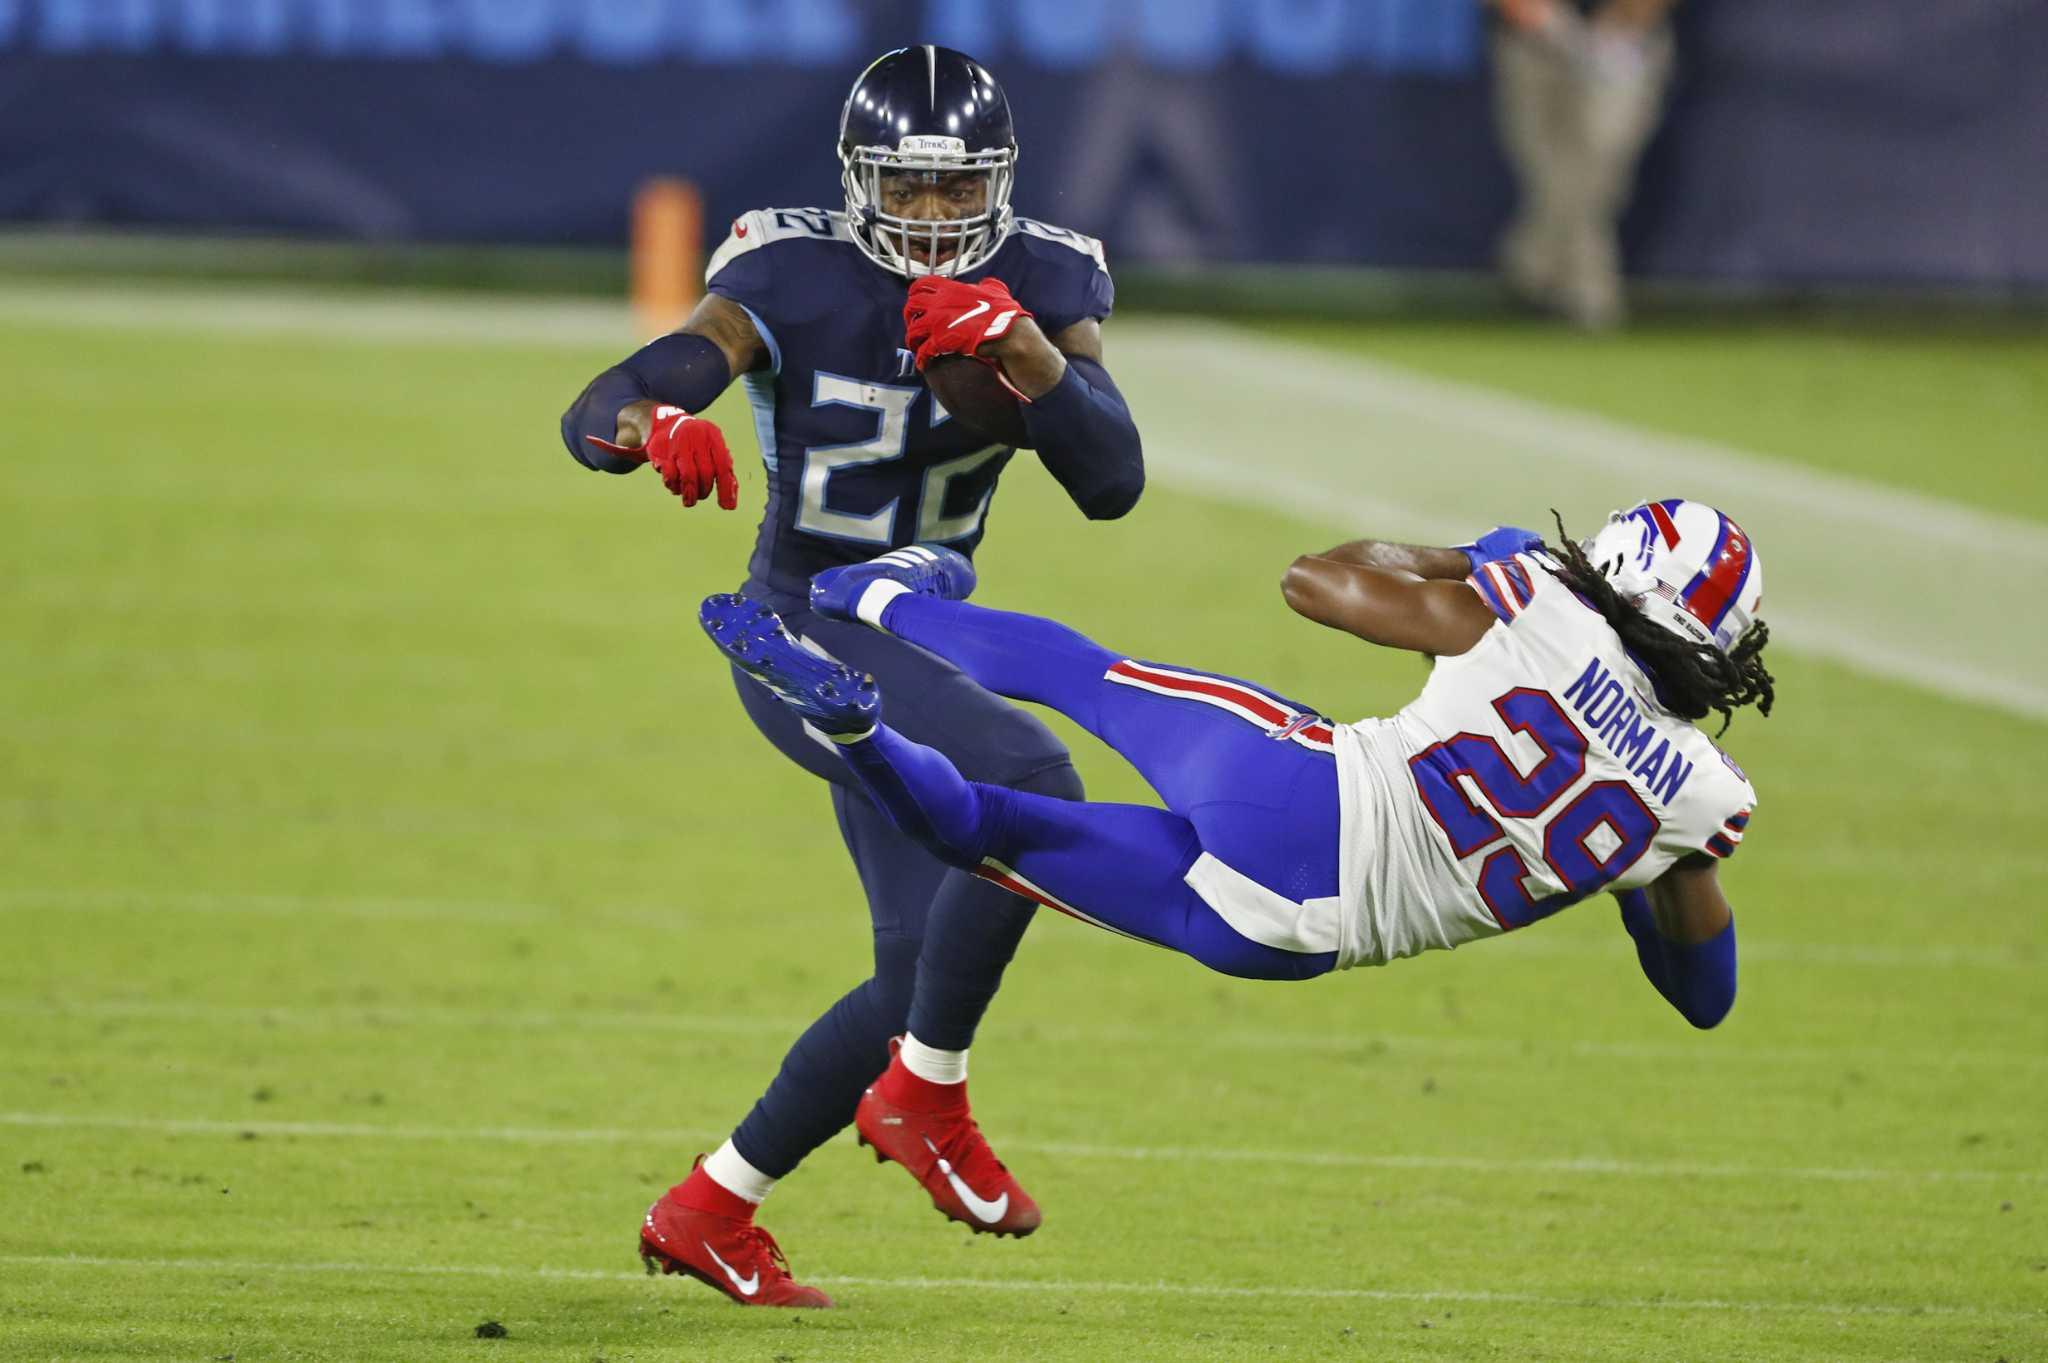 Texans know Titans' offense revolves around Derrick Henry - HoustonChronicle.com